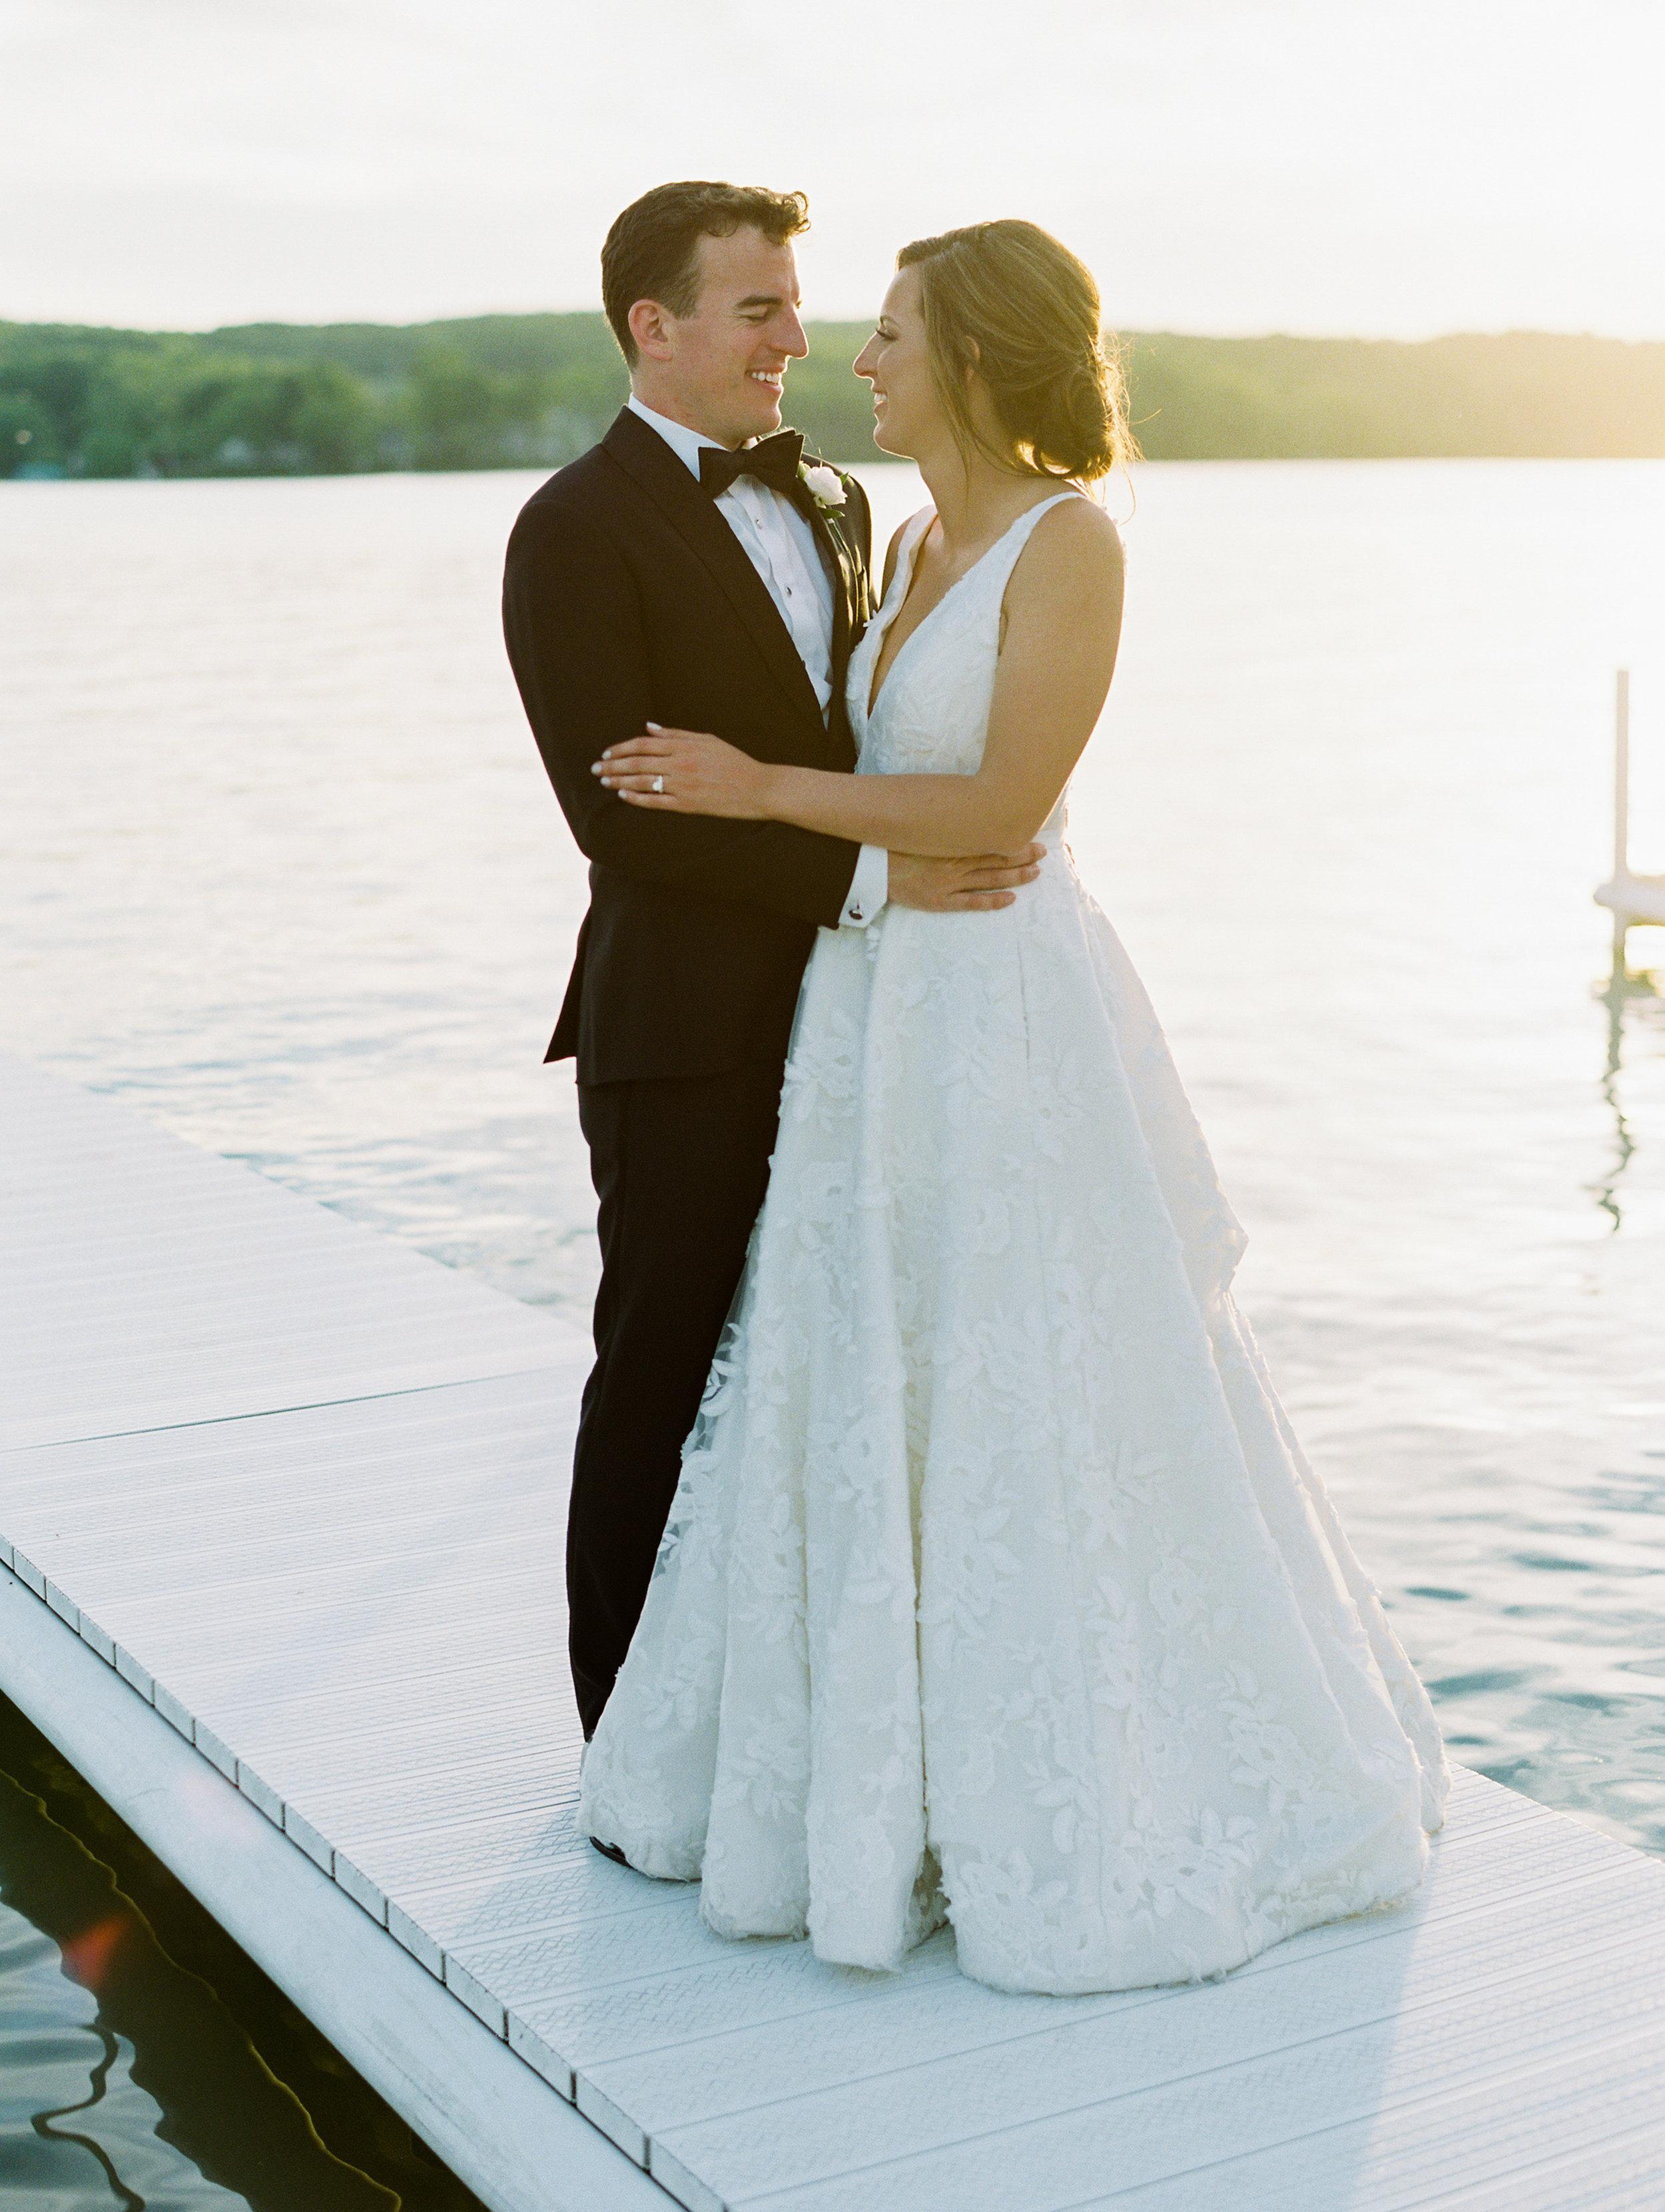 DeGuilio+Wedding+BrideGroomSunsetf-6.jpg